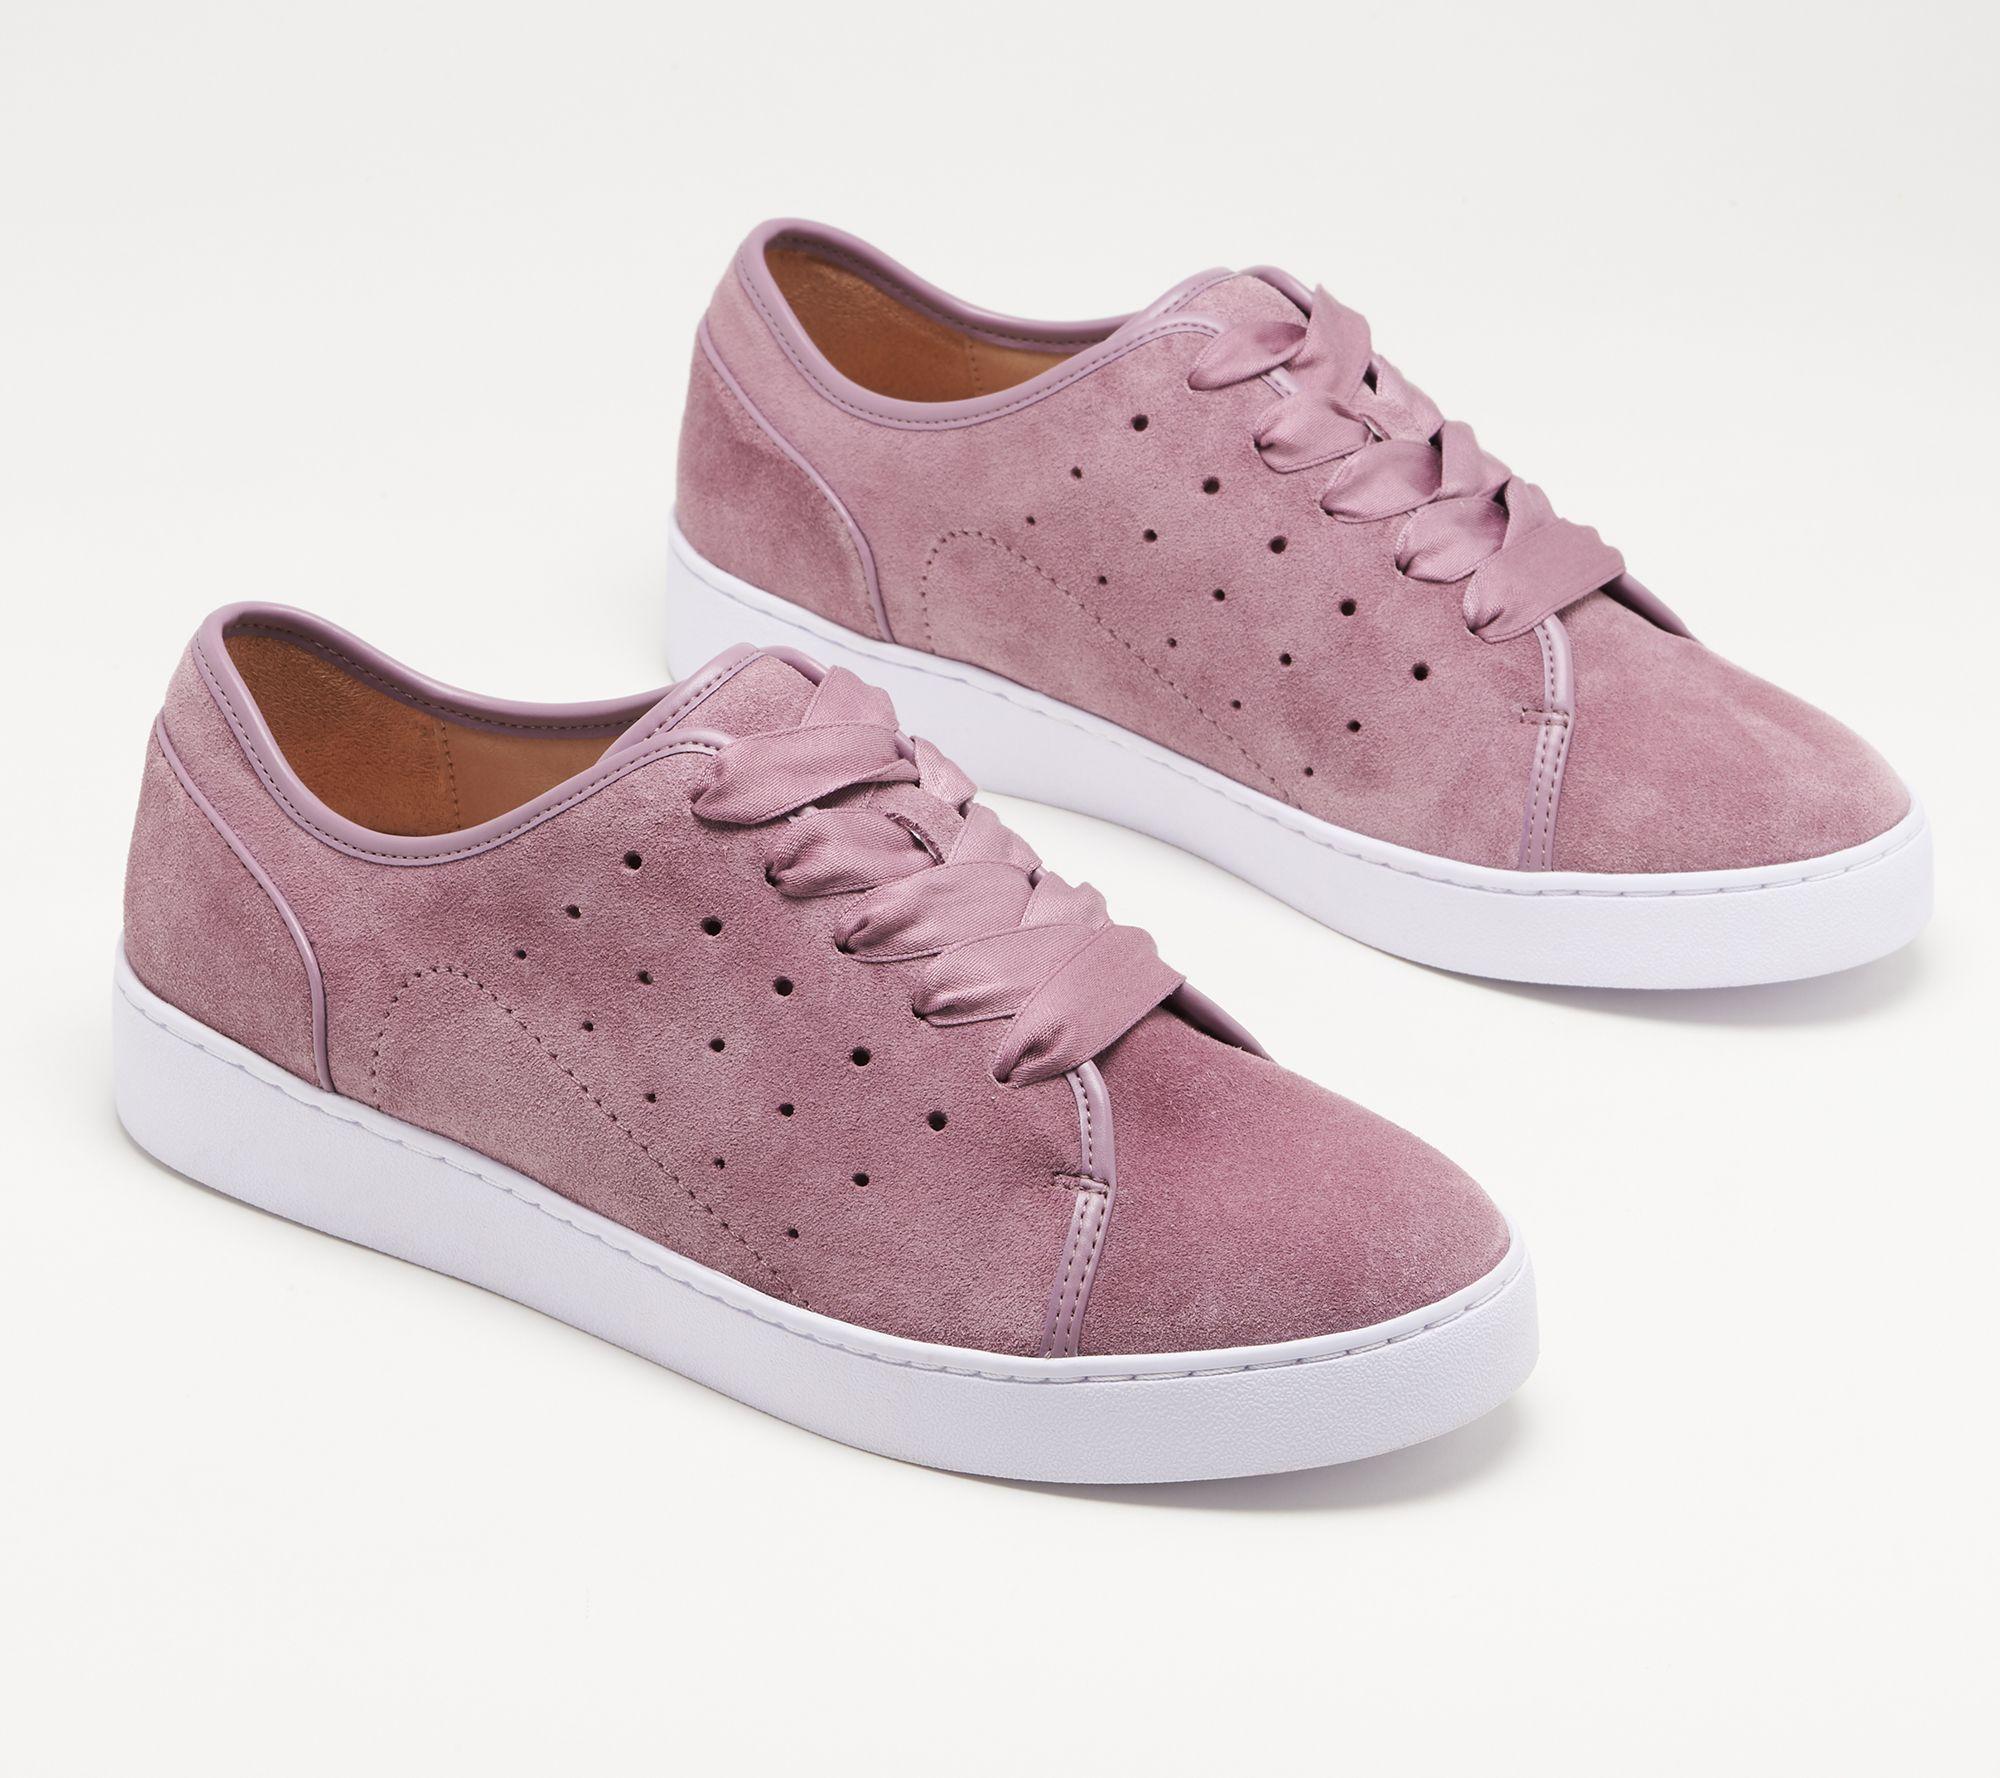 1e2eb3eee7f Vionic Suede Lace-Up Sneakers - Keke — QVC.com